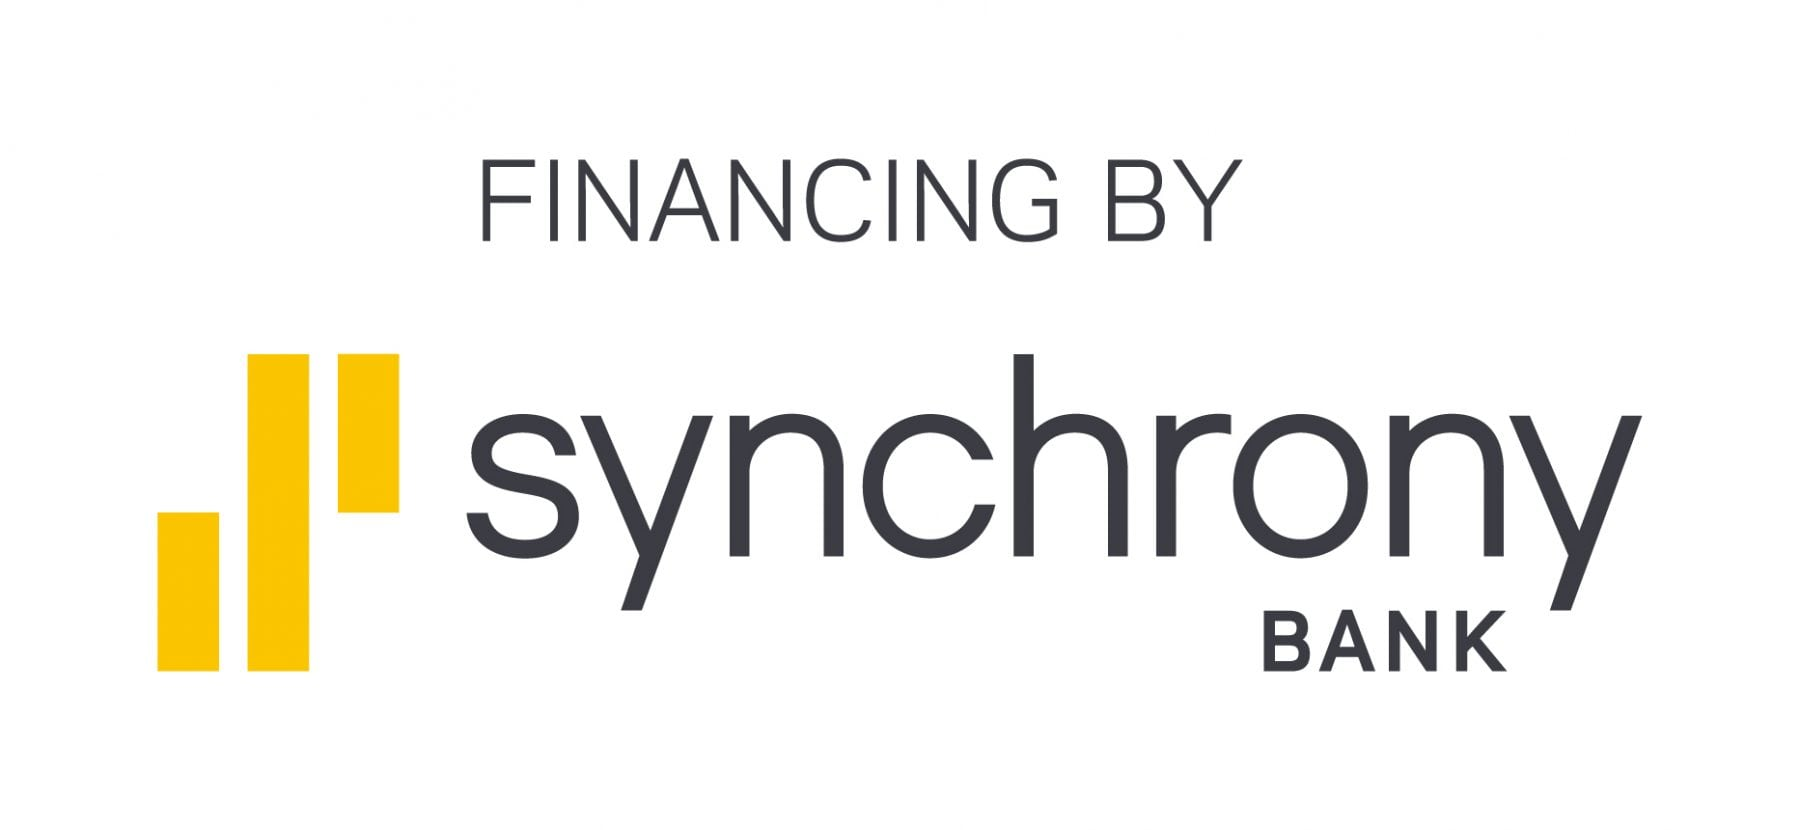 Financing By Synchrony Bank Logo